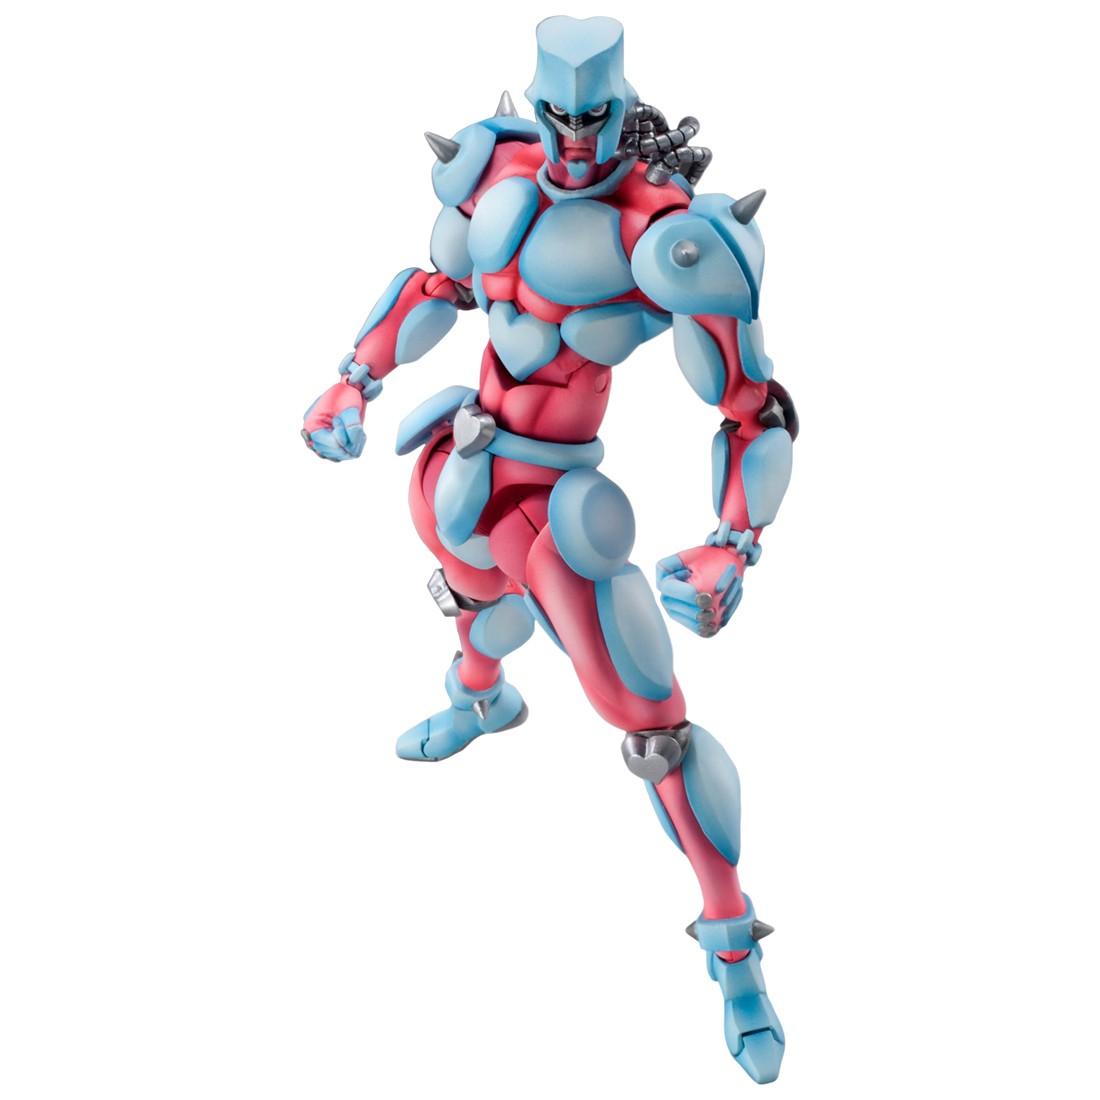 Medicos Super Action Statue JoJo's Bizarre Adventure Part 4 Diamond Is Unbreakable Crazy Diamond Chozokado Figure Re-Run (blue)